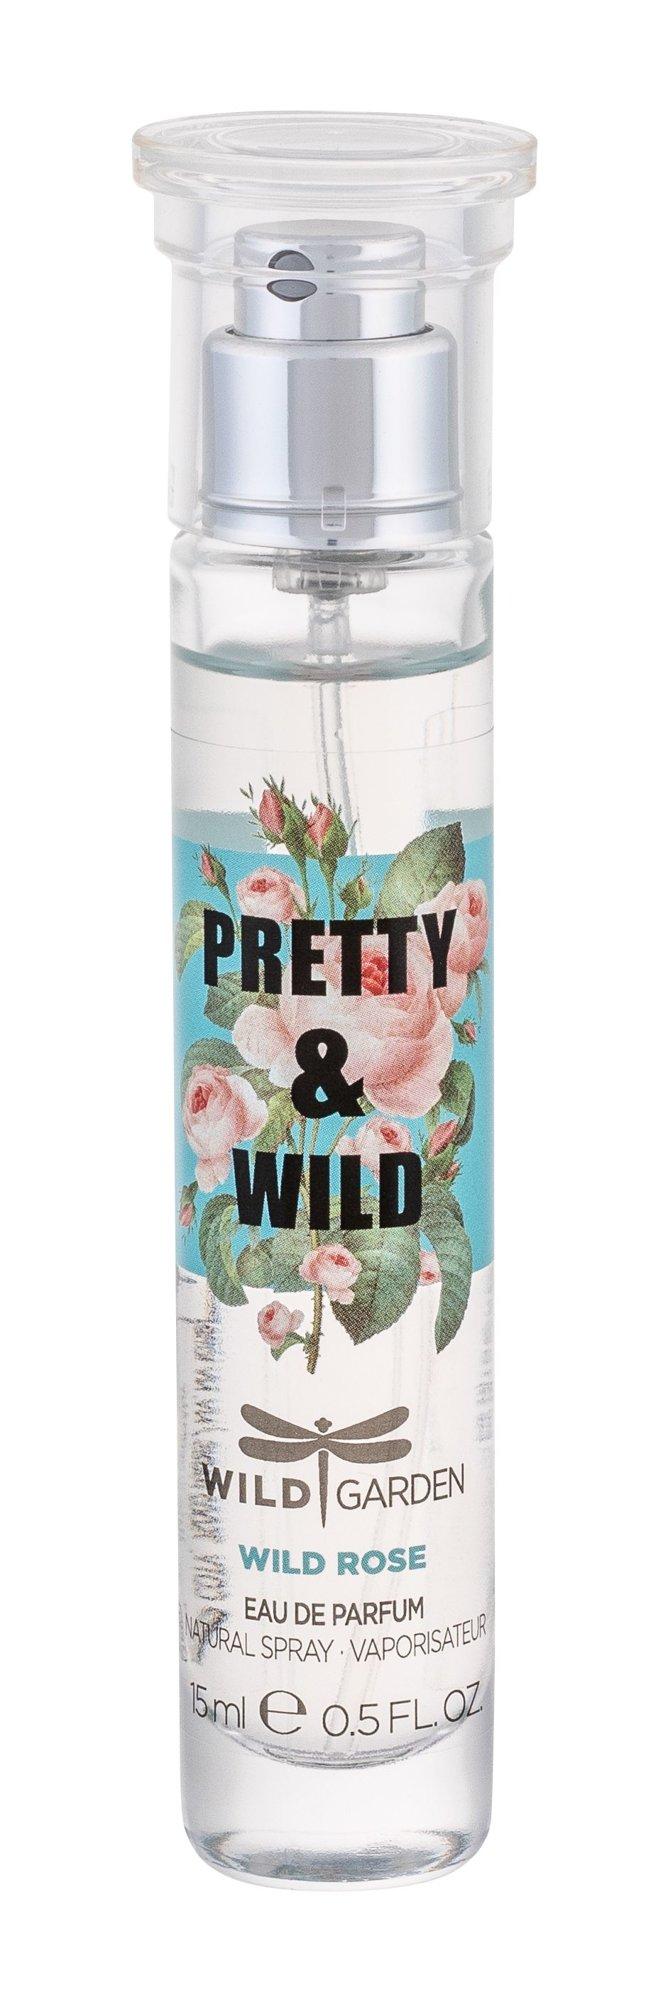 Wild Garden Pretty & Wild Eau de Parfum 15ml